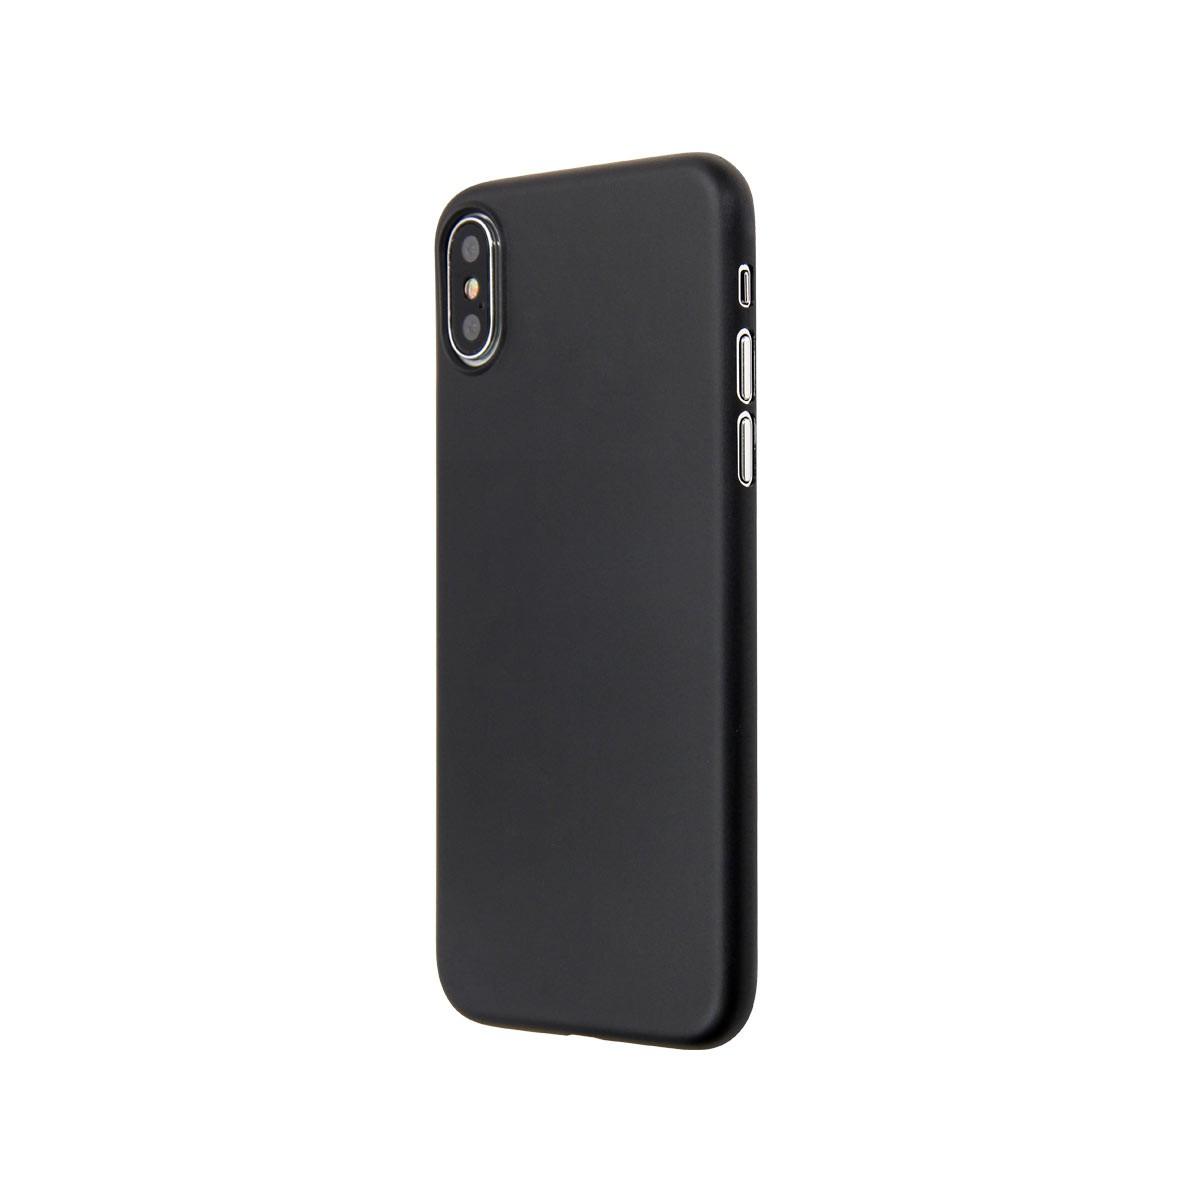 Capac protectie spate cellara colectia thin pentru iphone x - negru